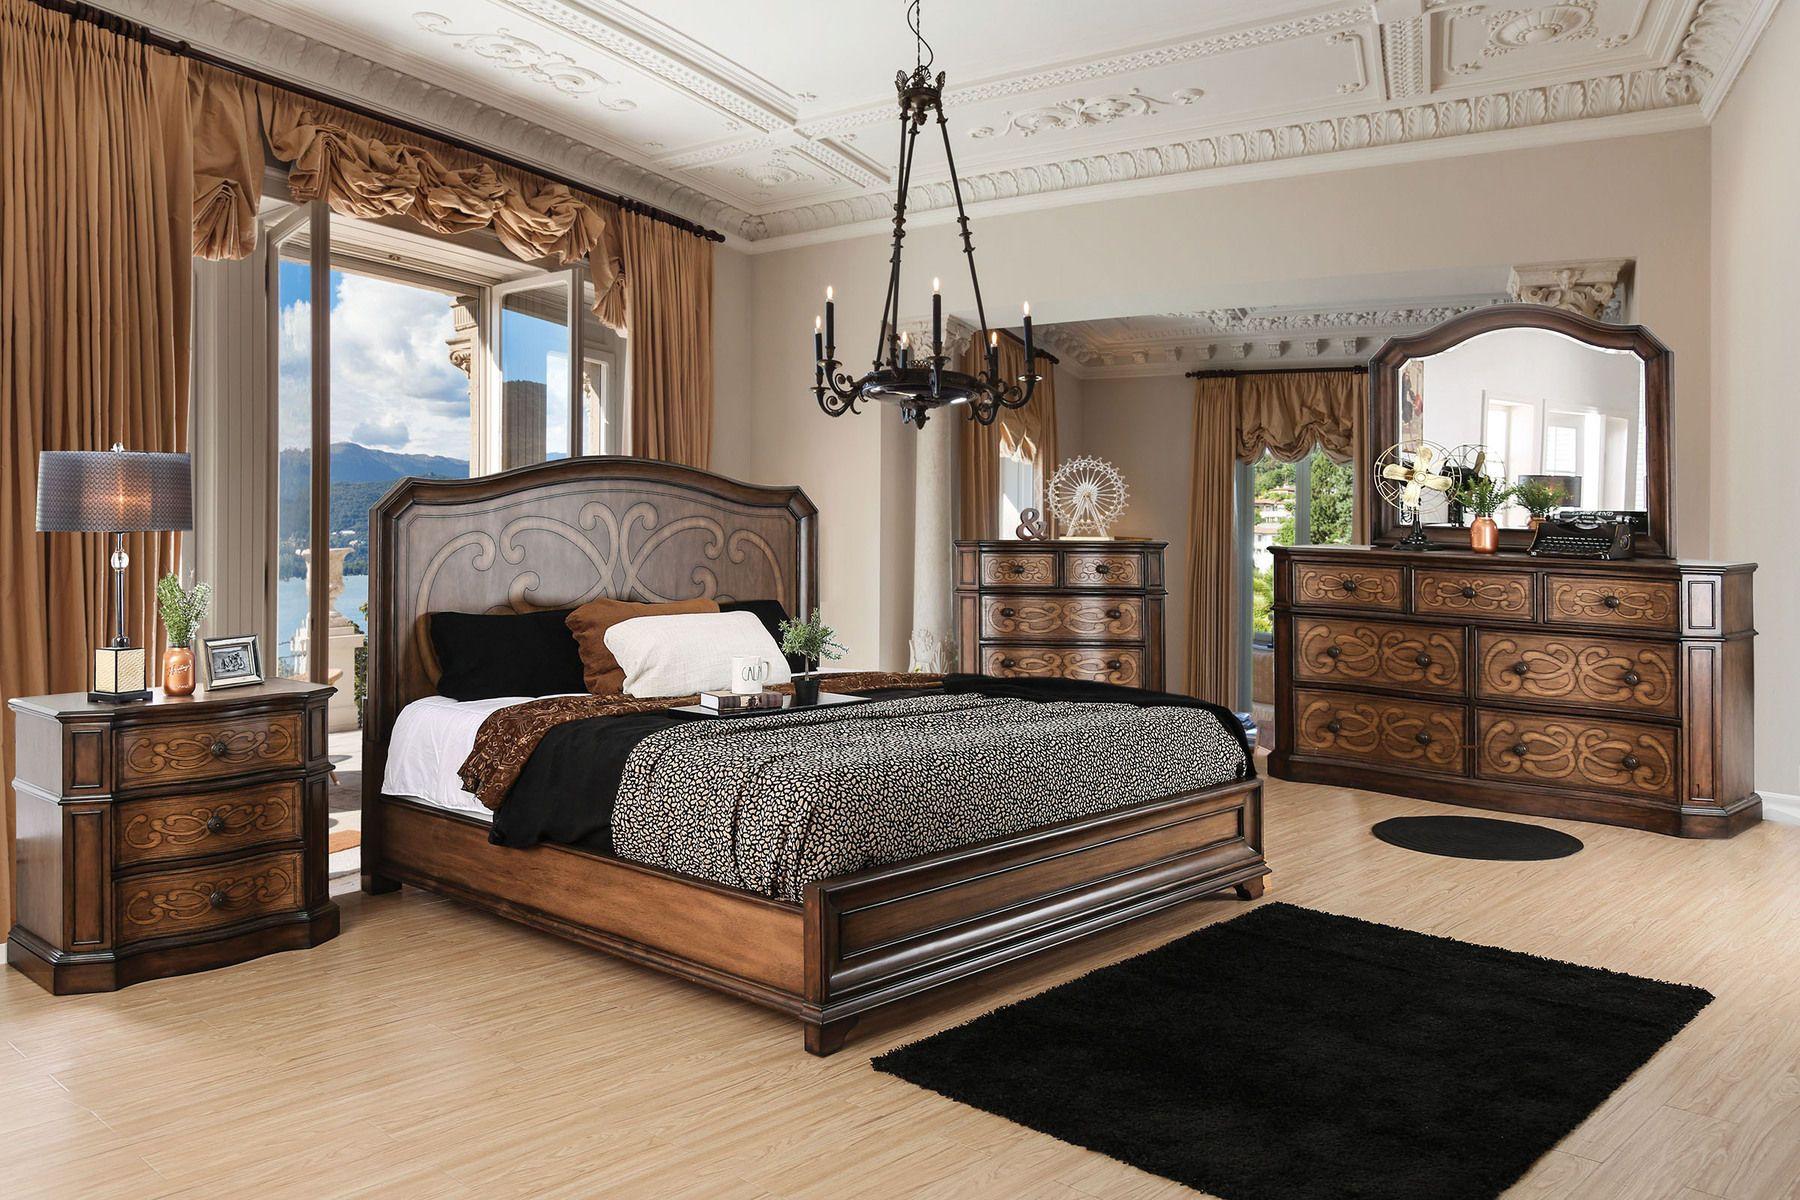 Furniture Of America Emmaline Transitional Style Chestnut